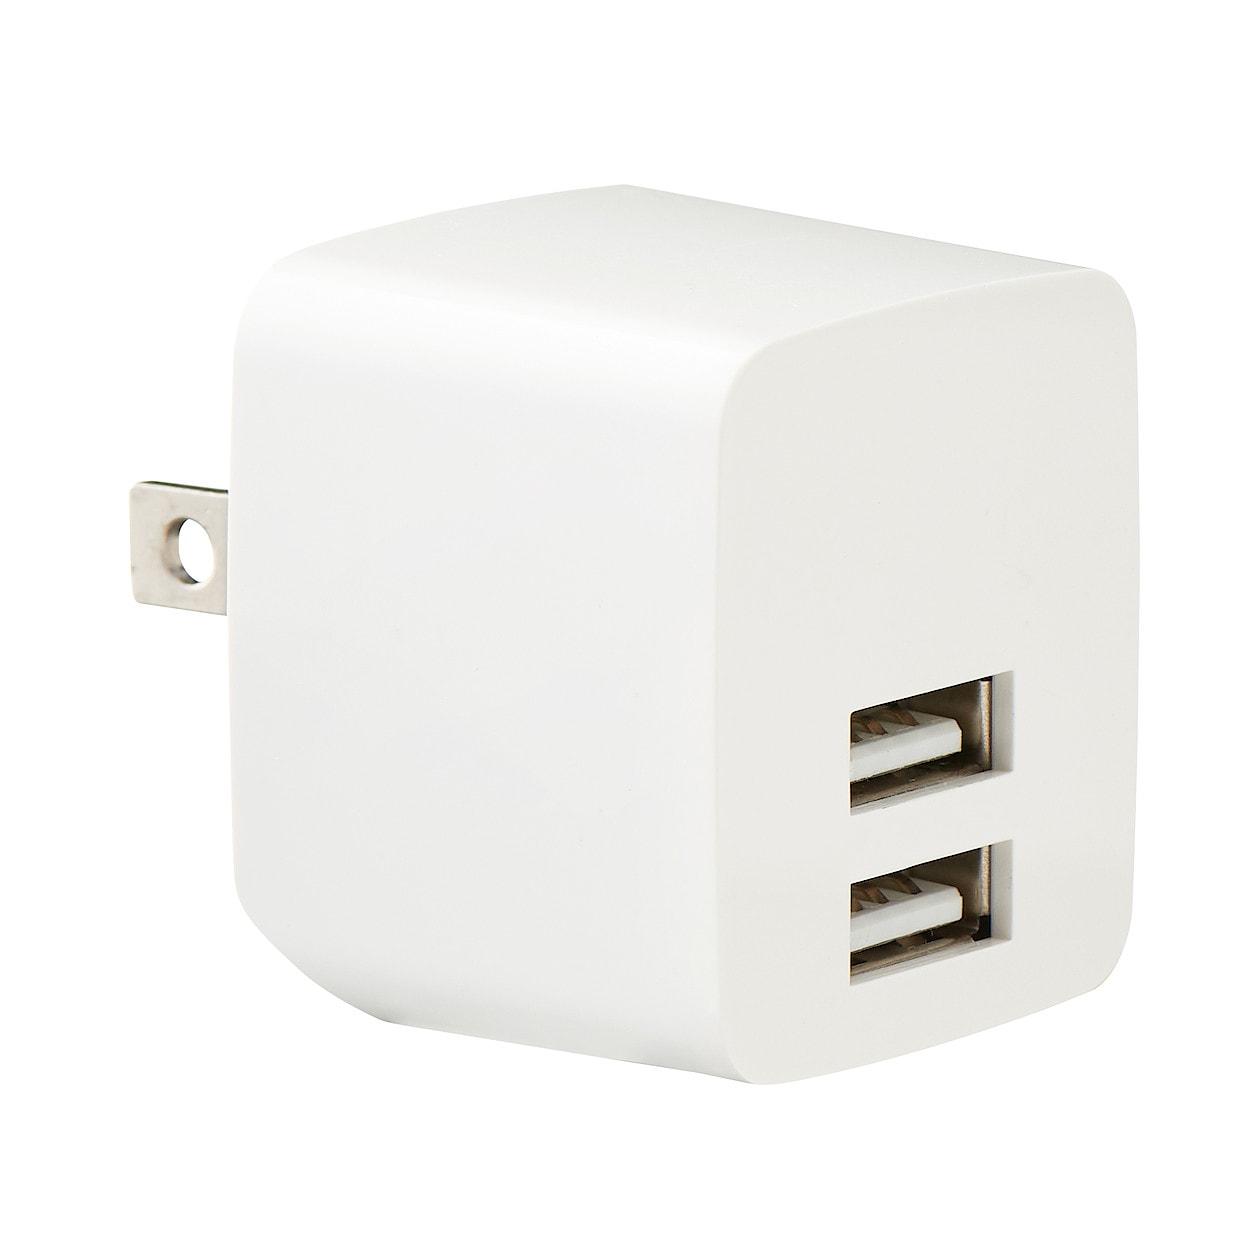 USB用プラグがしまえる急速充電器 MJ-PA1 通販 | 無印良品